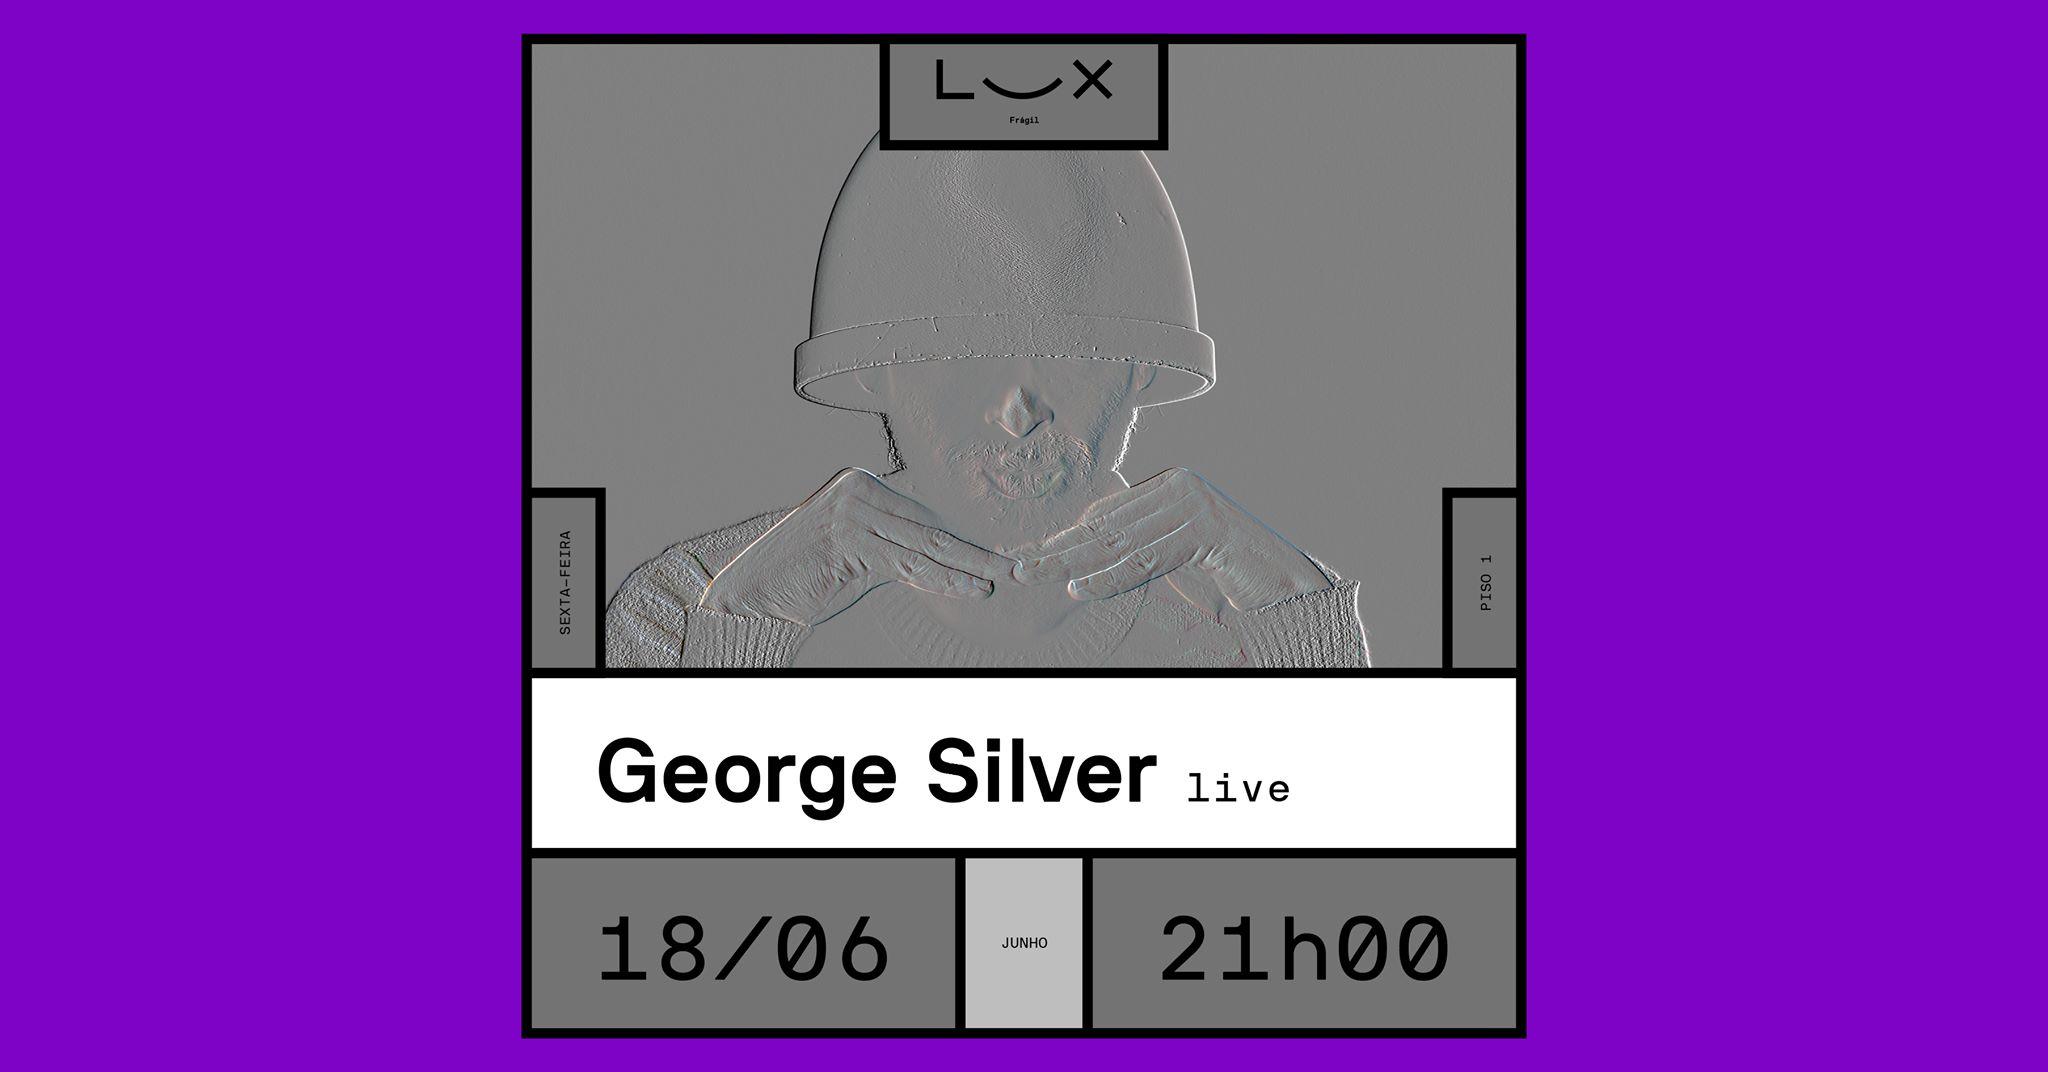 George Silver